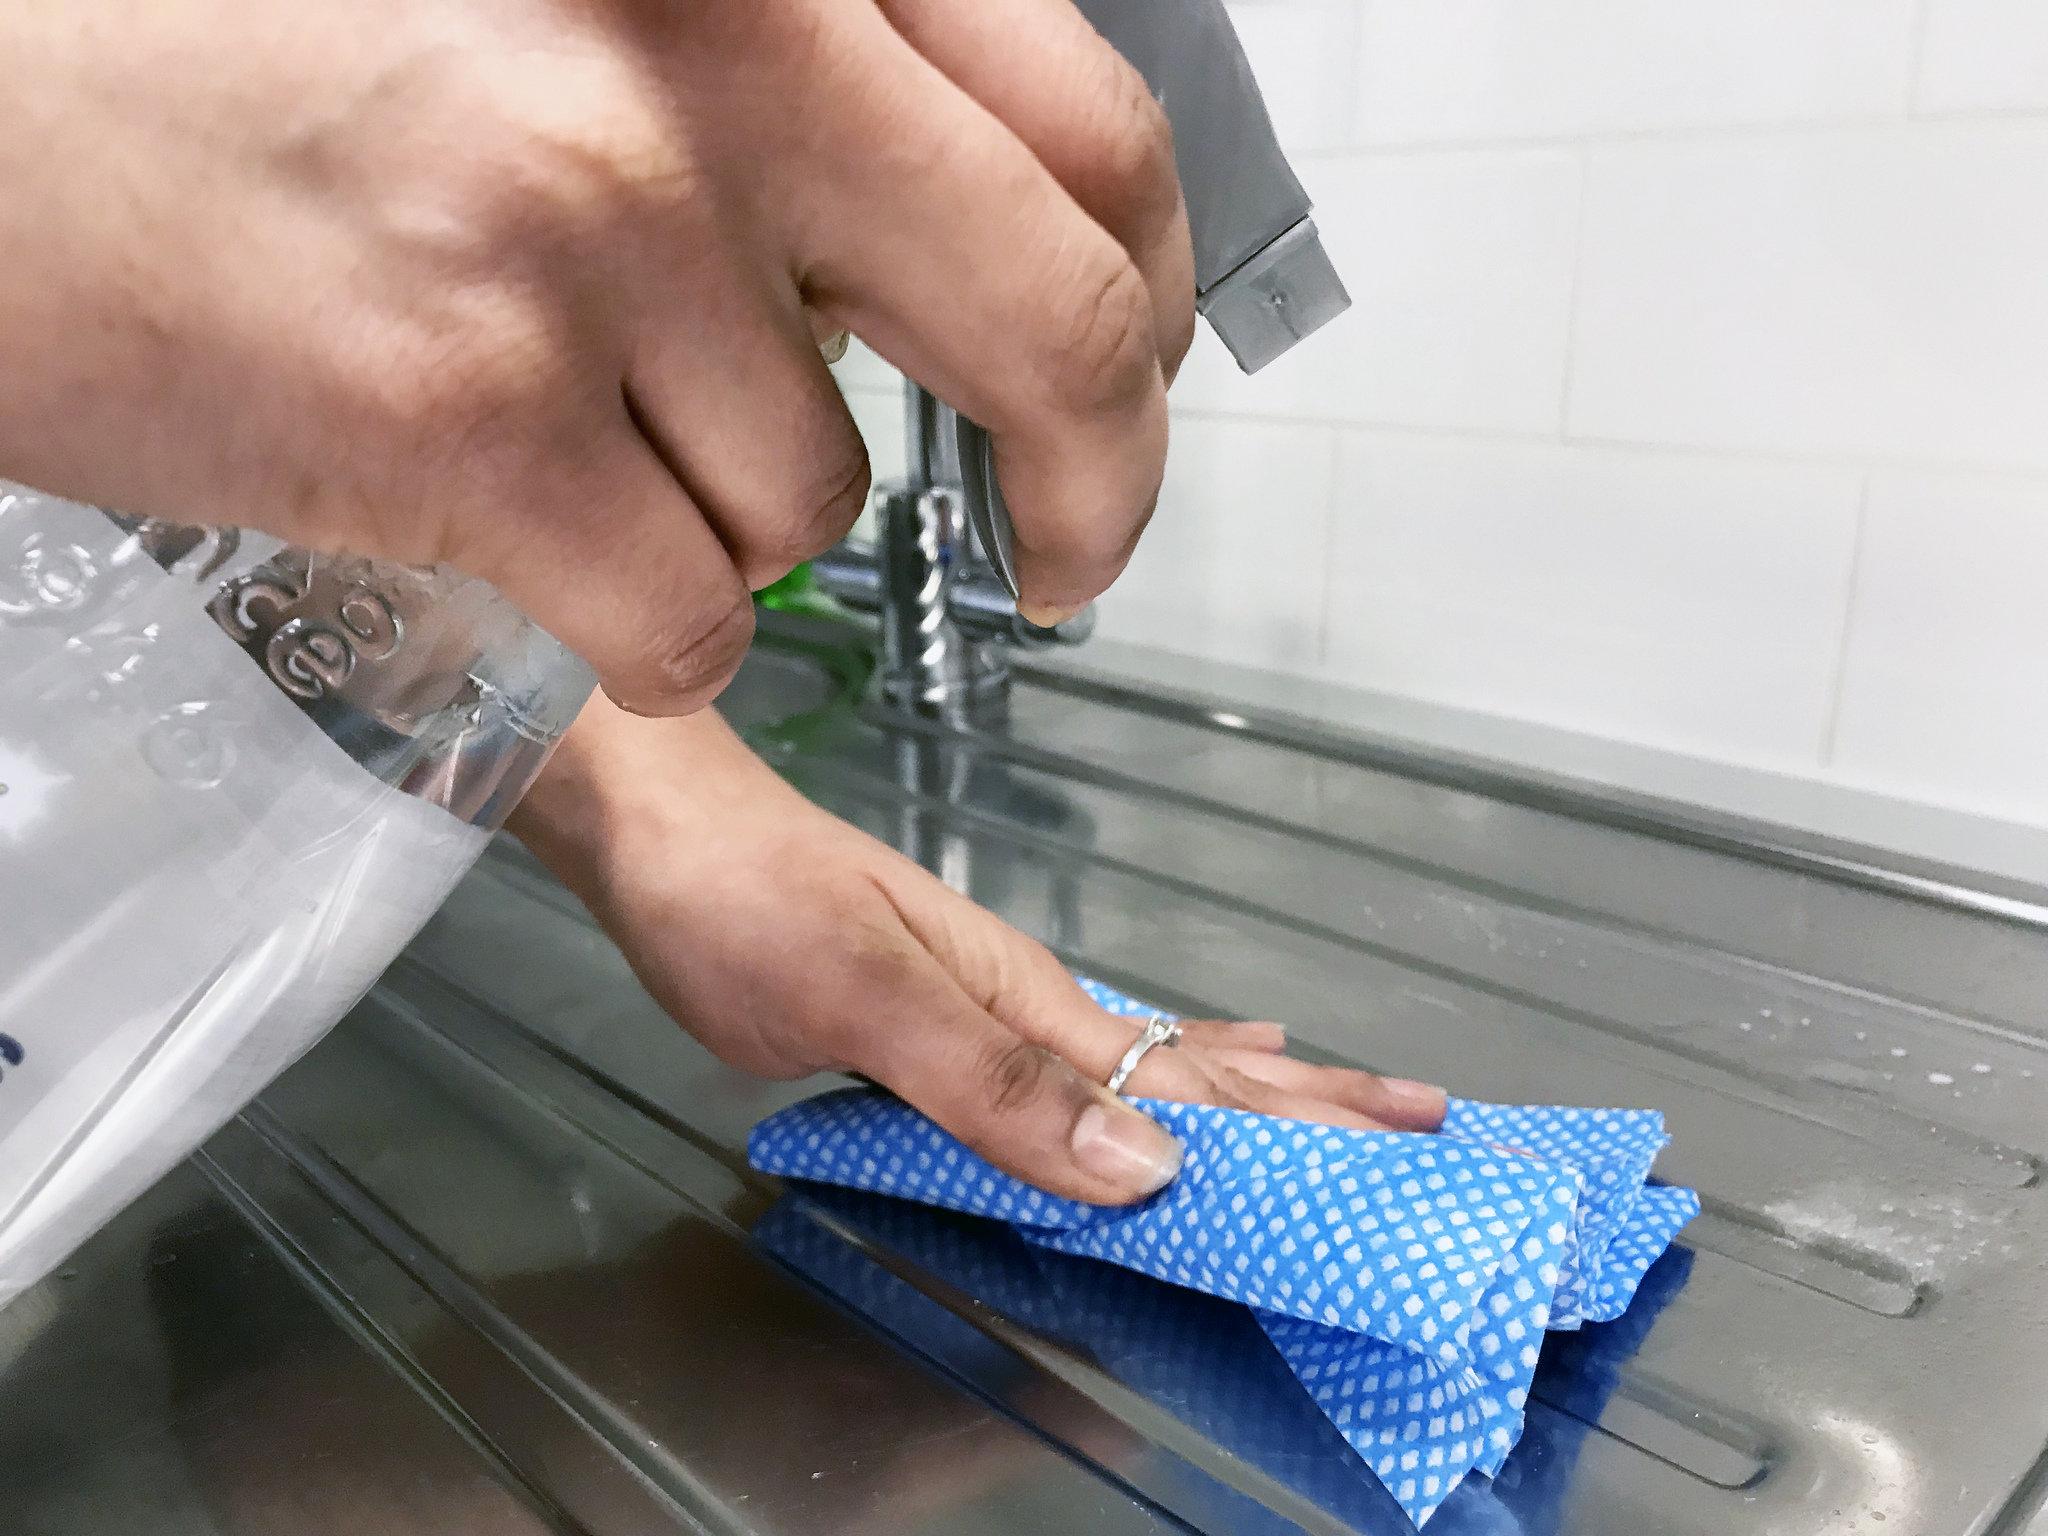 Woman using white vinegar spray to clean kitchen